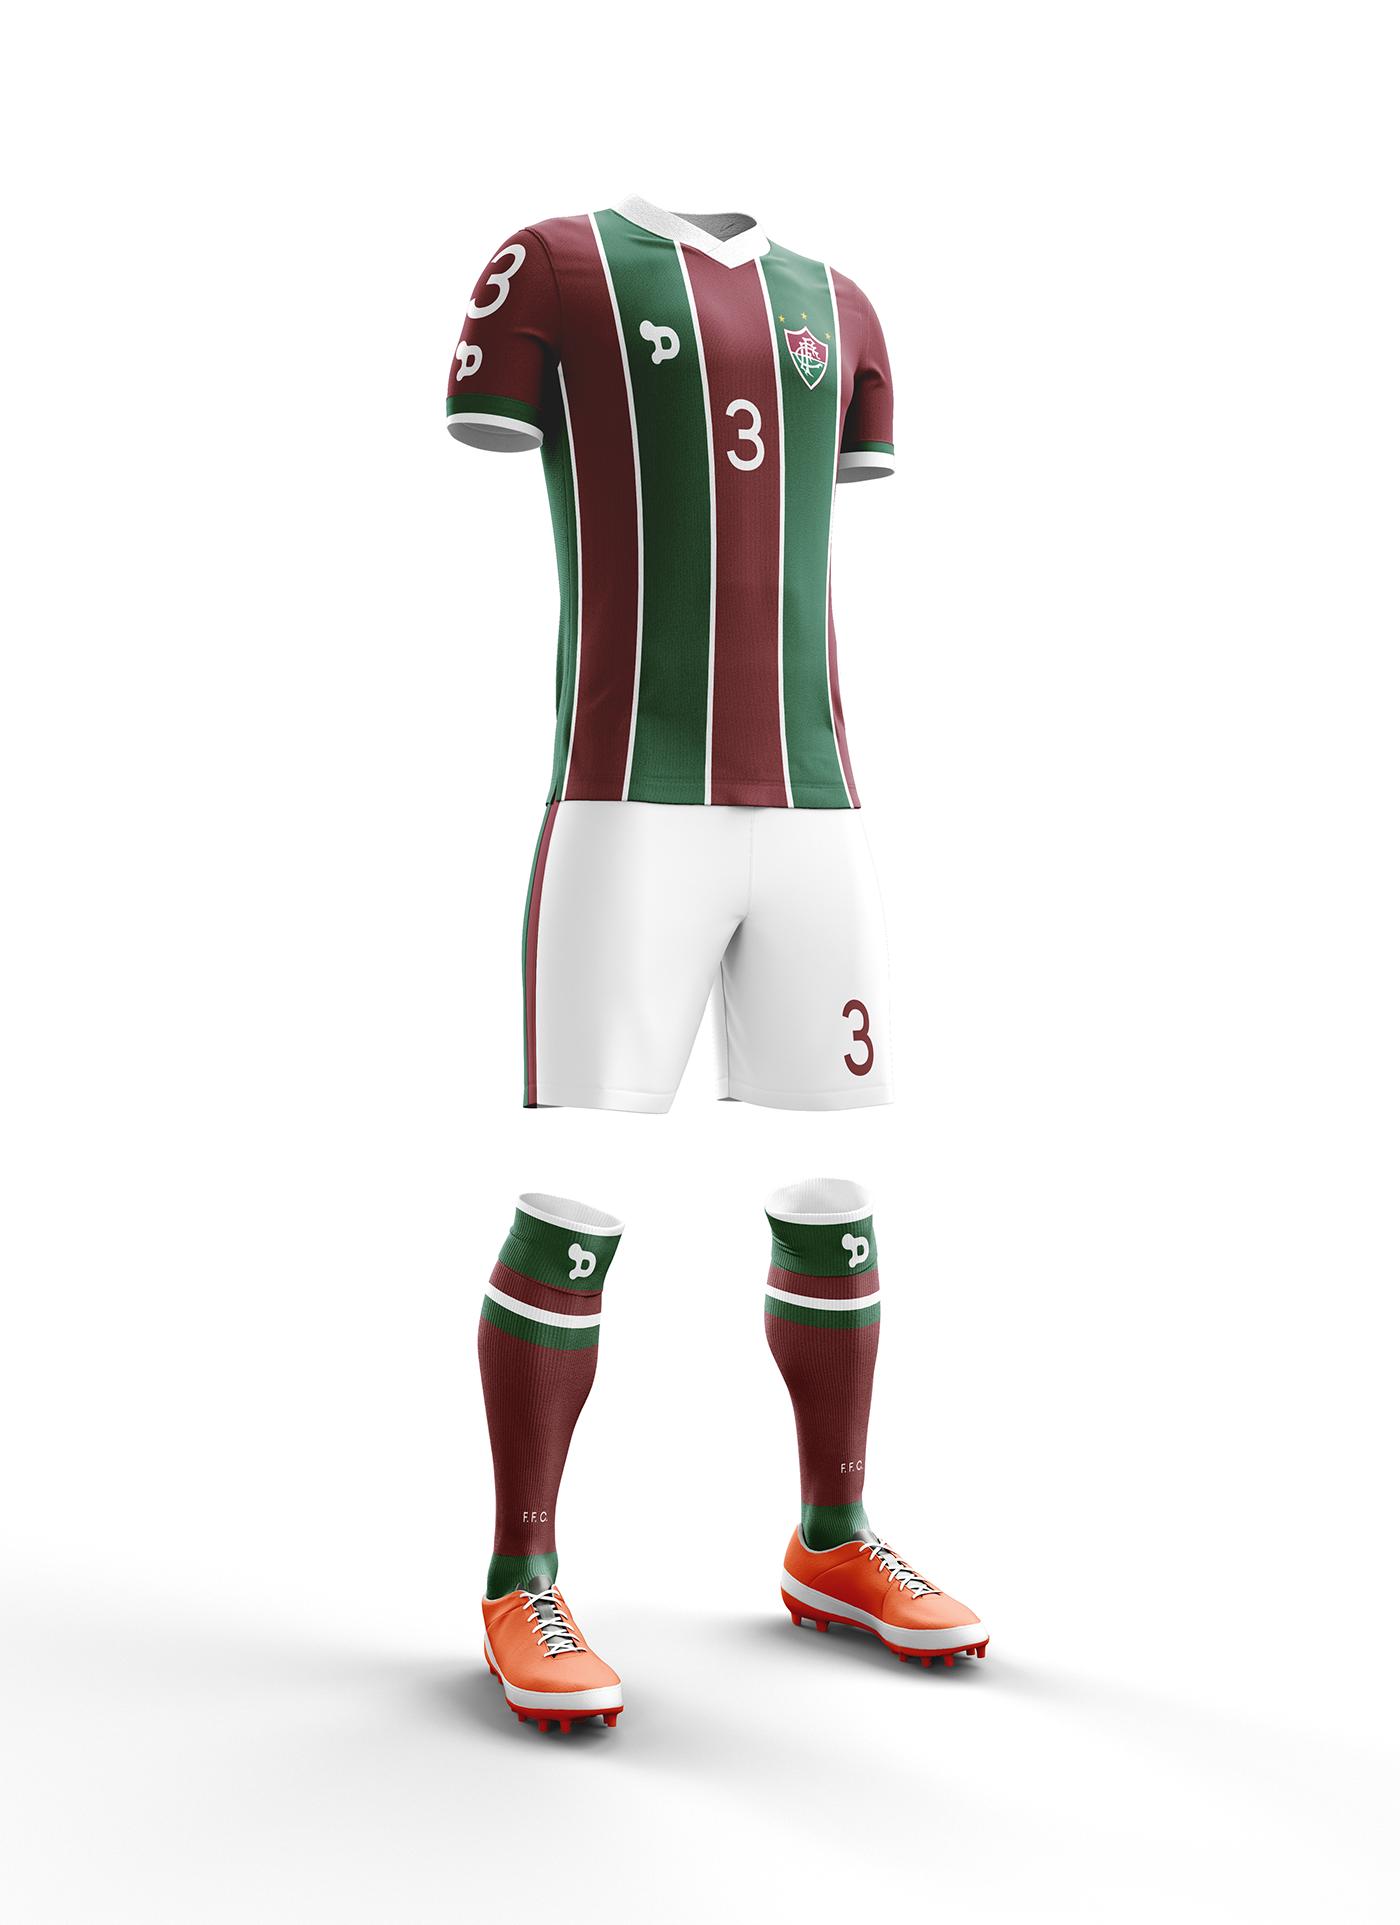 Proposta conceitual para o novo uniforme do Fluminense Football Club ... 34a0b0c8494f4